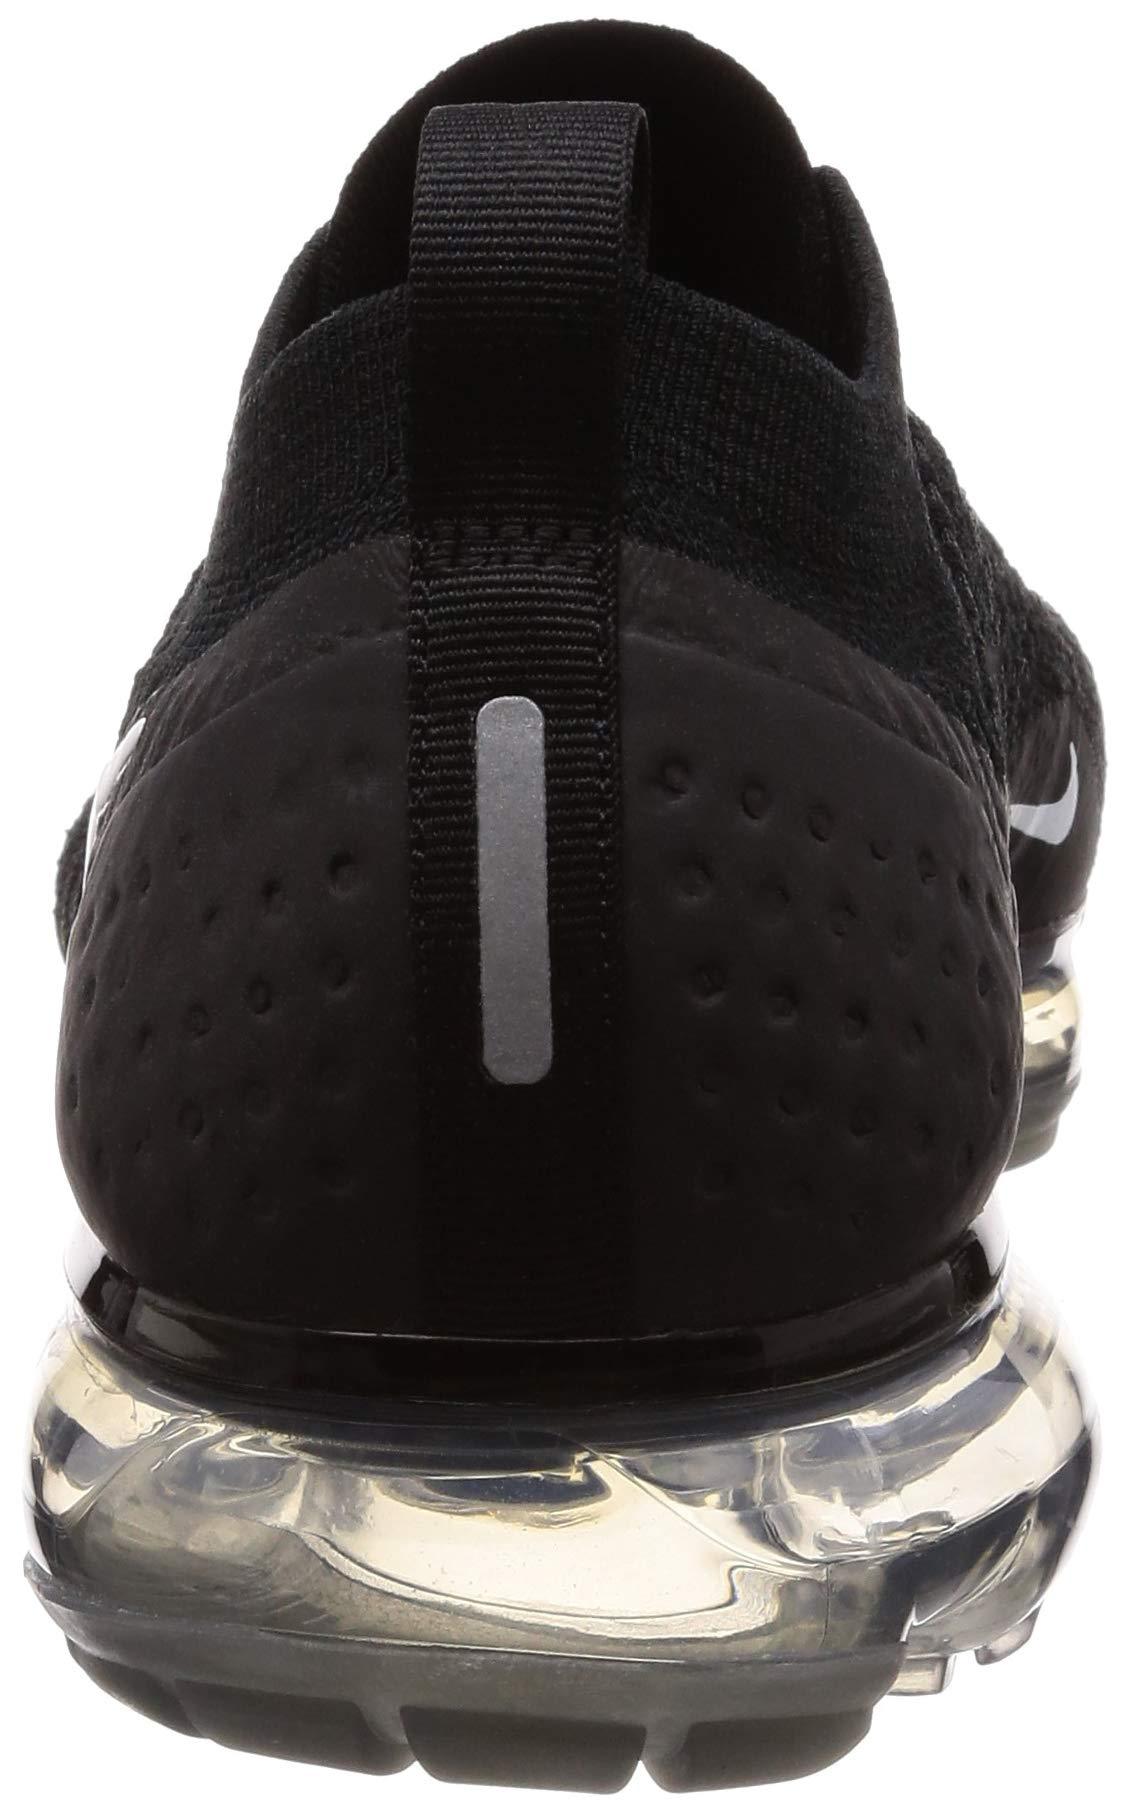 71R2nX%2BN4vL - Nike Men's Air Vapormax Flyknit 2 Low-Top Sneakers